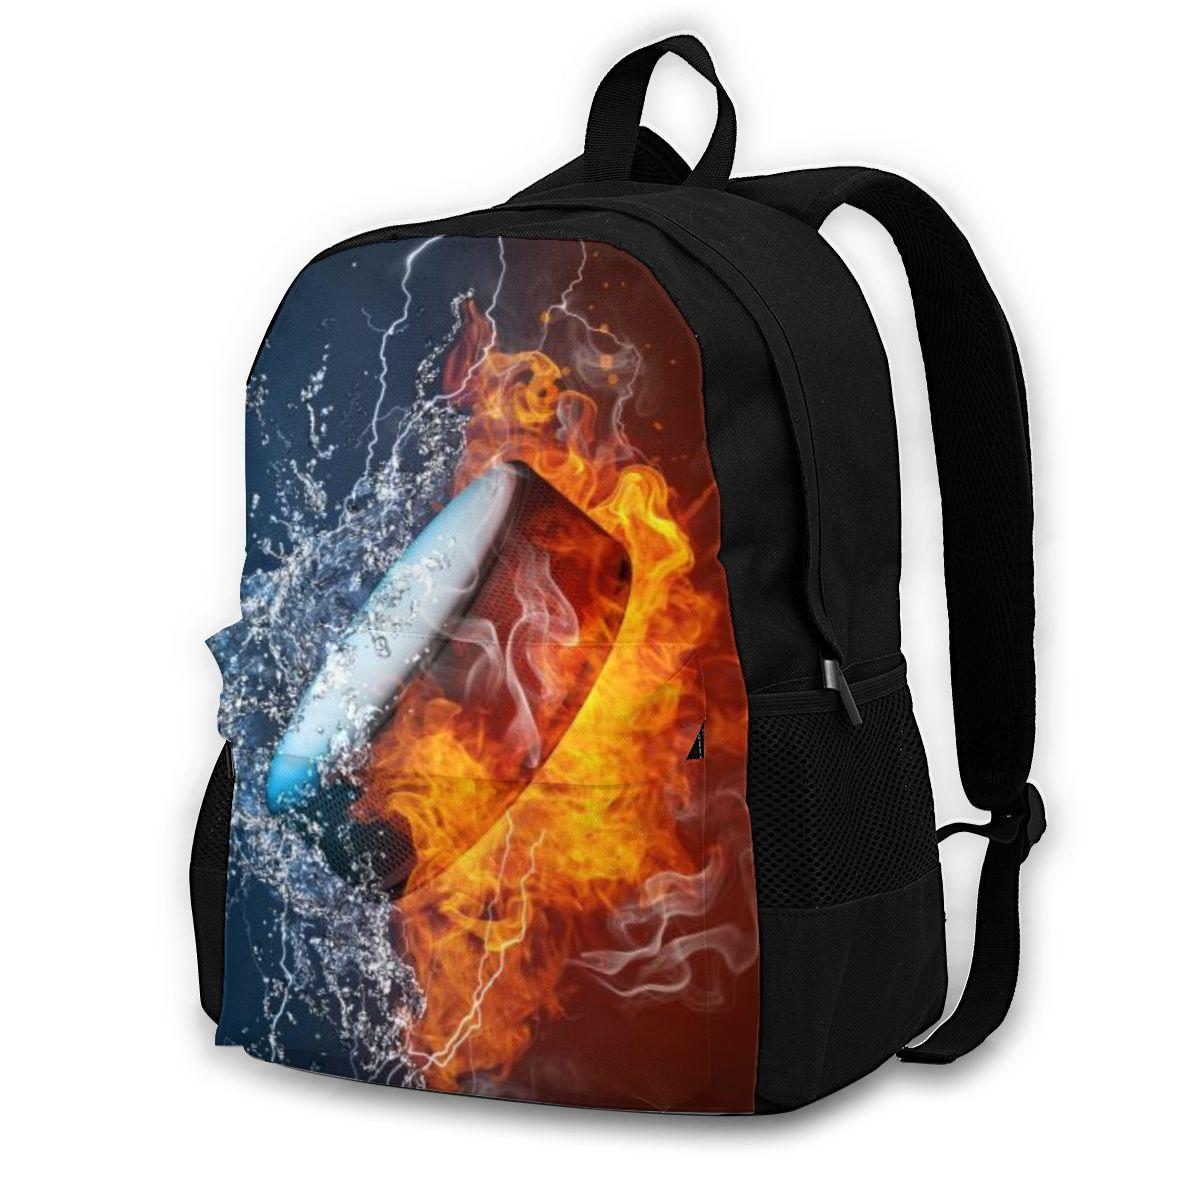 Mochila De 2020, bolso de hombro para mujer, bolso de escuela de moda para adolescentes, mochila para chica, bolsa de viaje para Hockey sobre hielo y agua